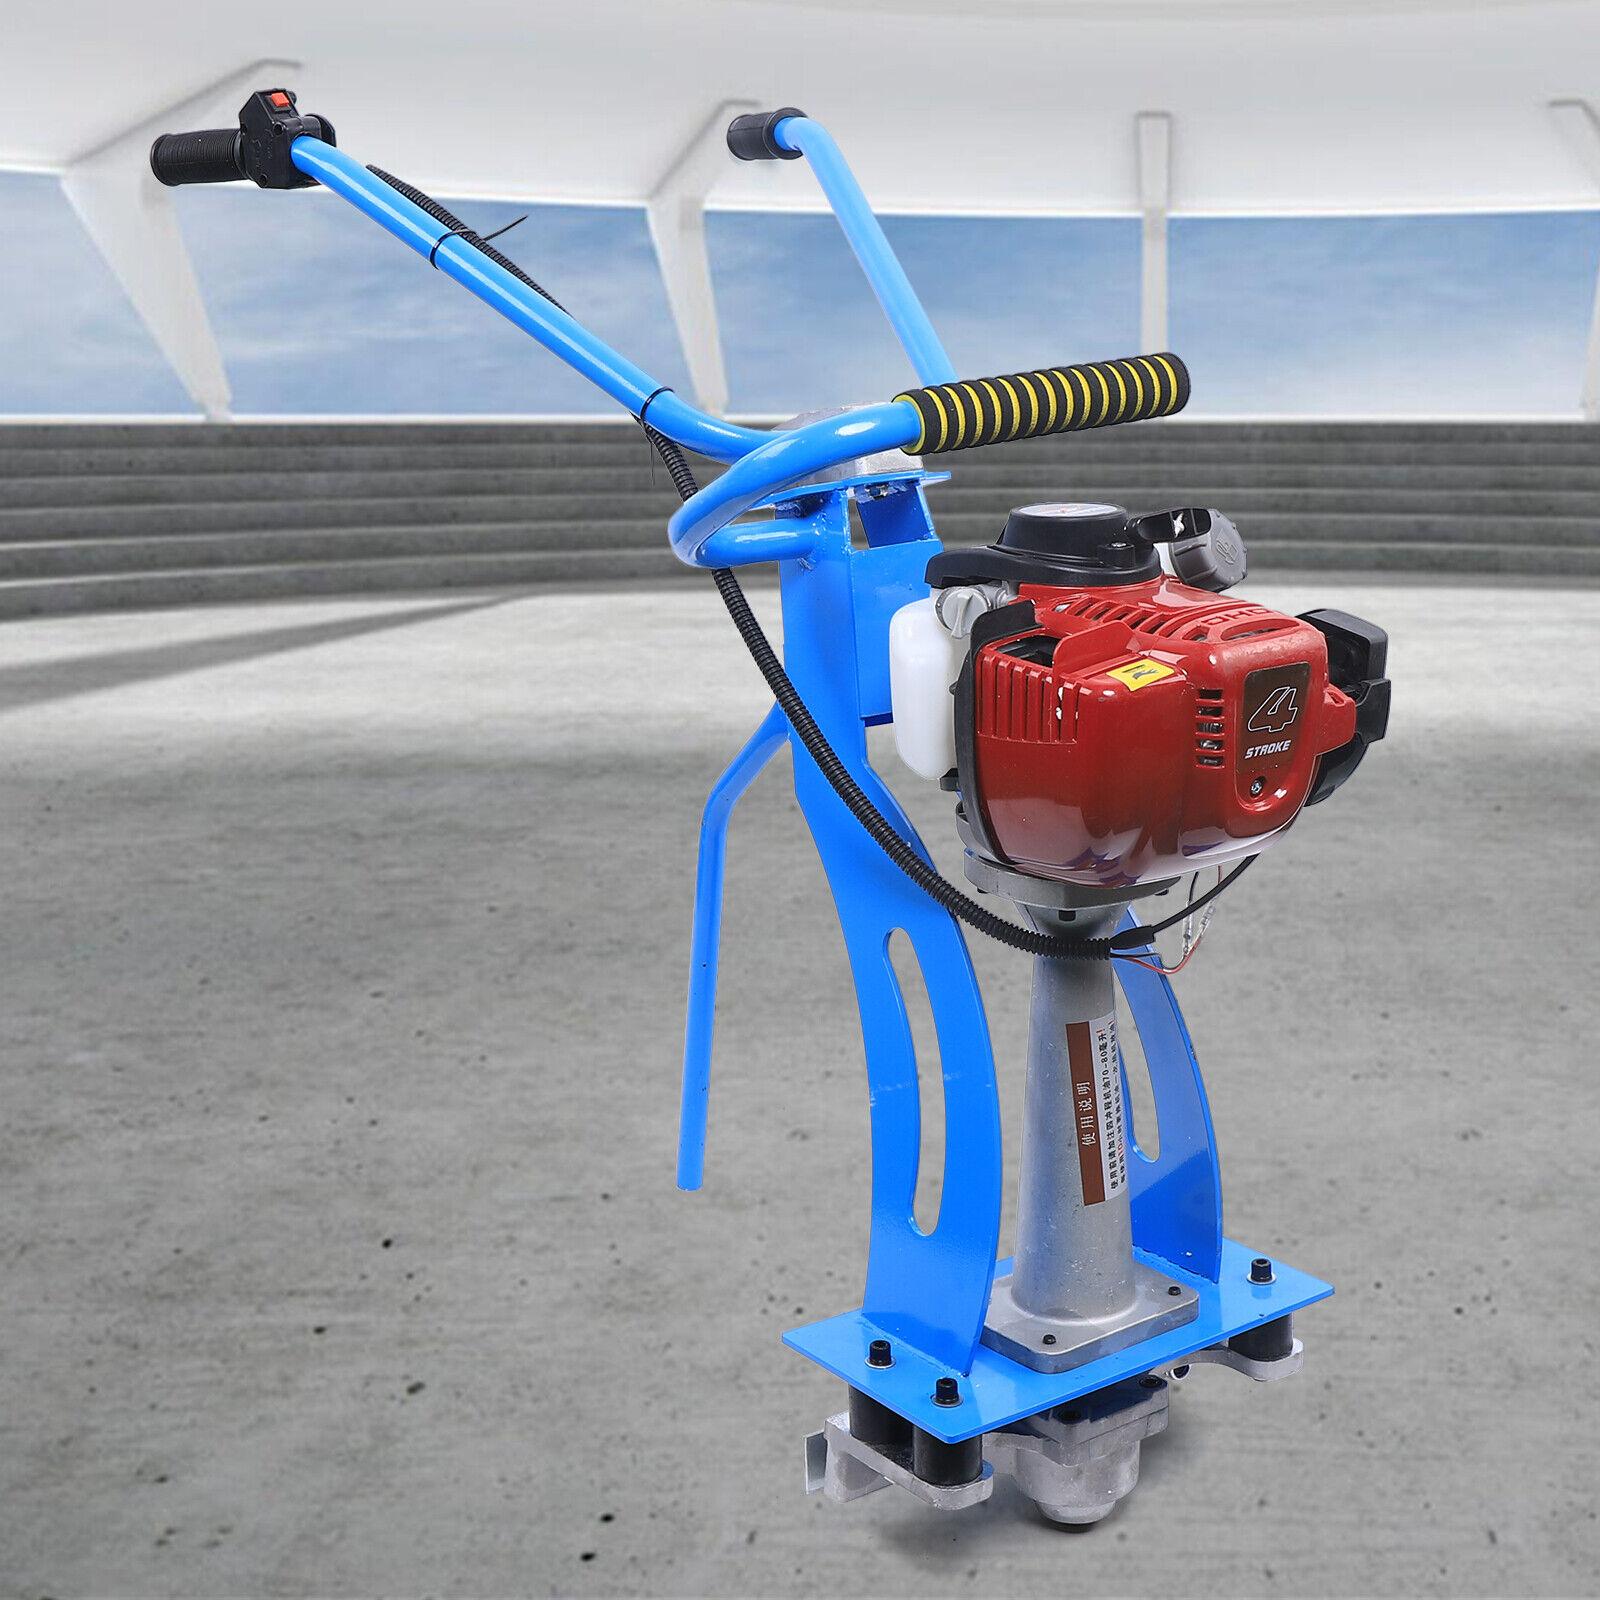 4Takt 900W Beton Vibrationsmaschine Zement Vibrator Estrich Dicke Stahlplatte